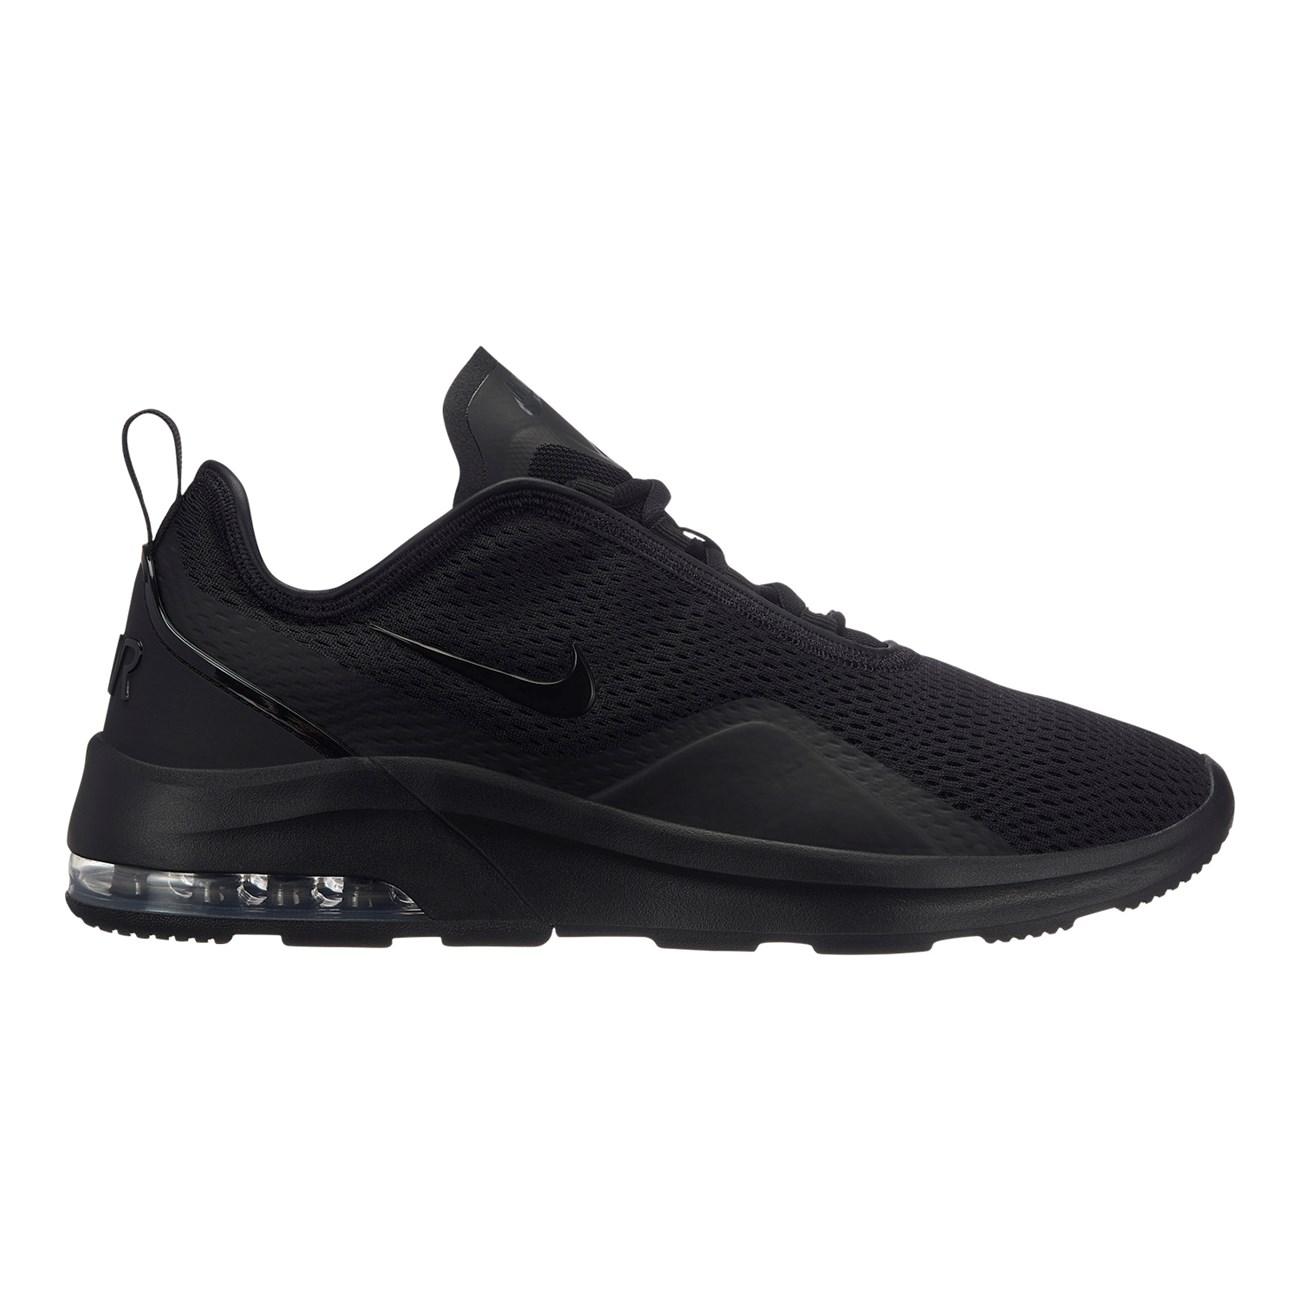 NIKE AIR MAX MOTION 2   Sportstyle Παπούτσια  fd44e5088dd